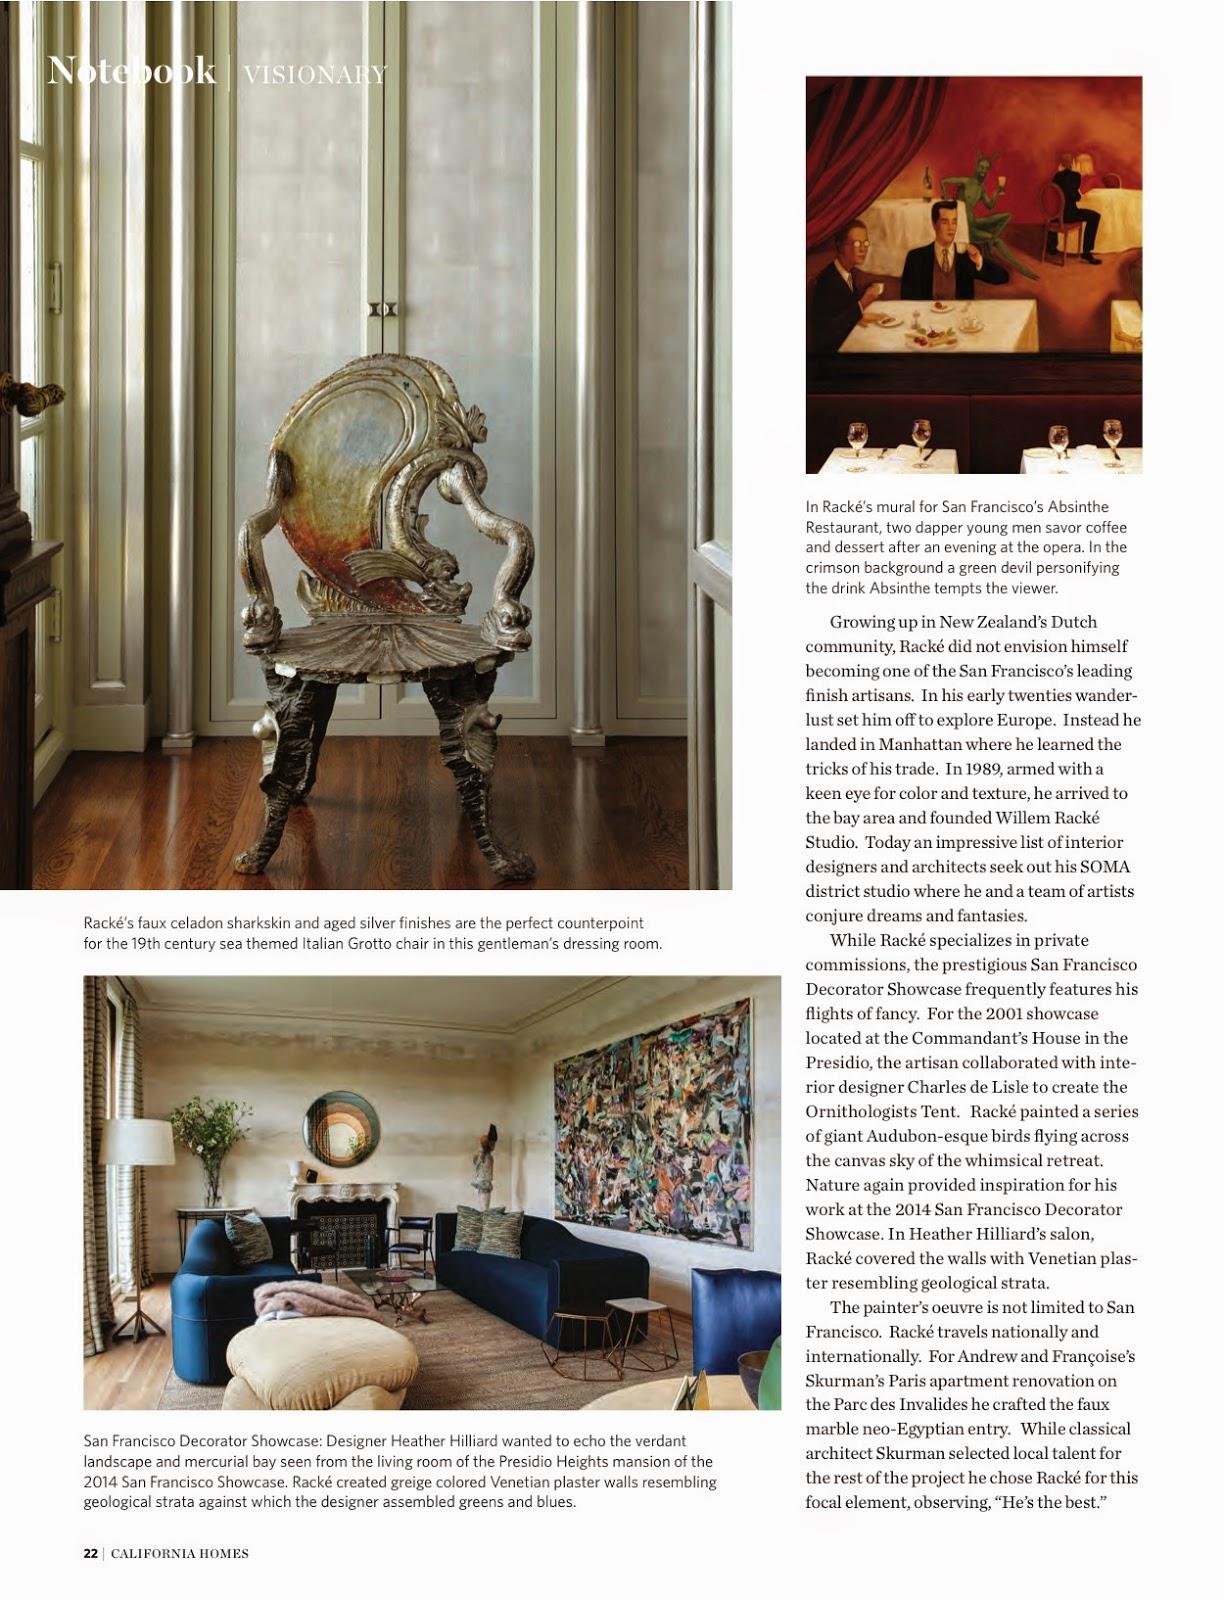 Decorative Painter Willem Rack California Homes Magazine Fall 2014